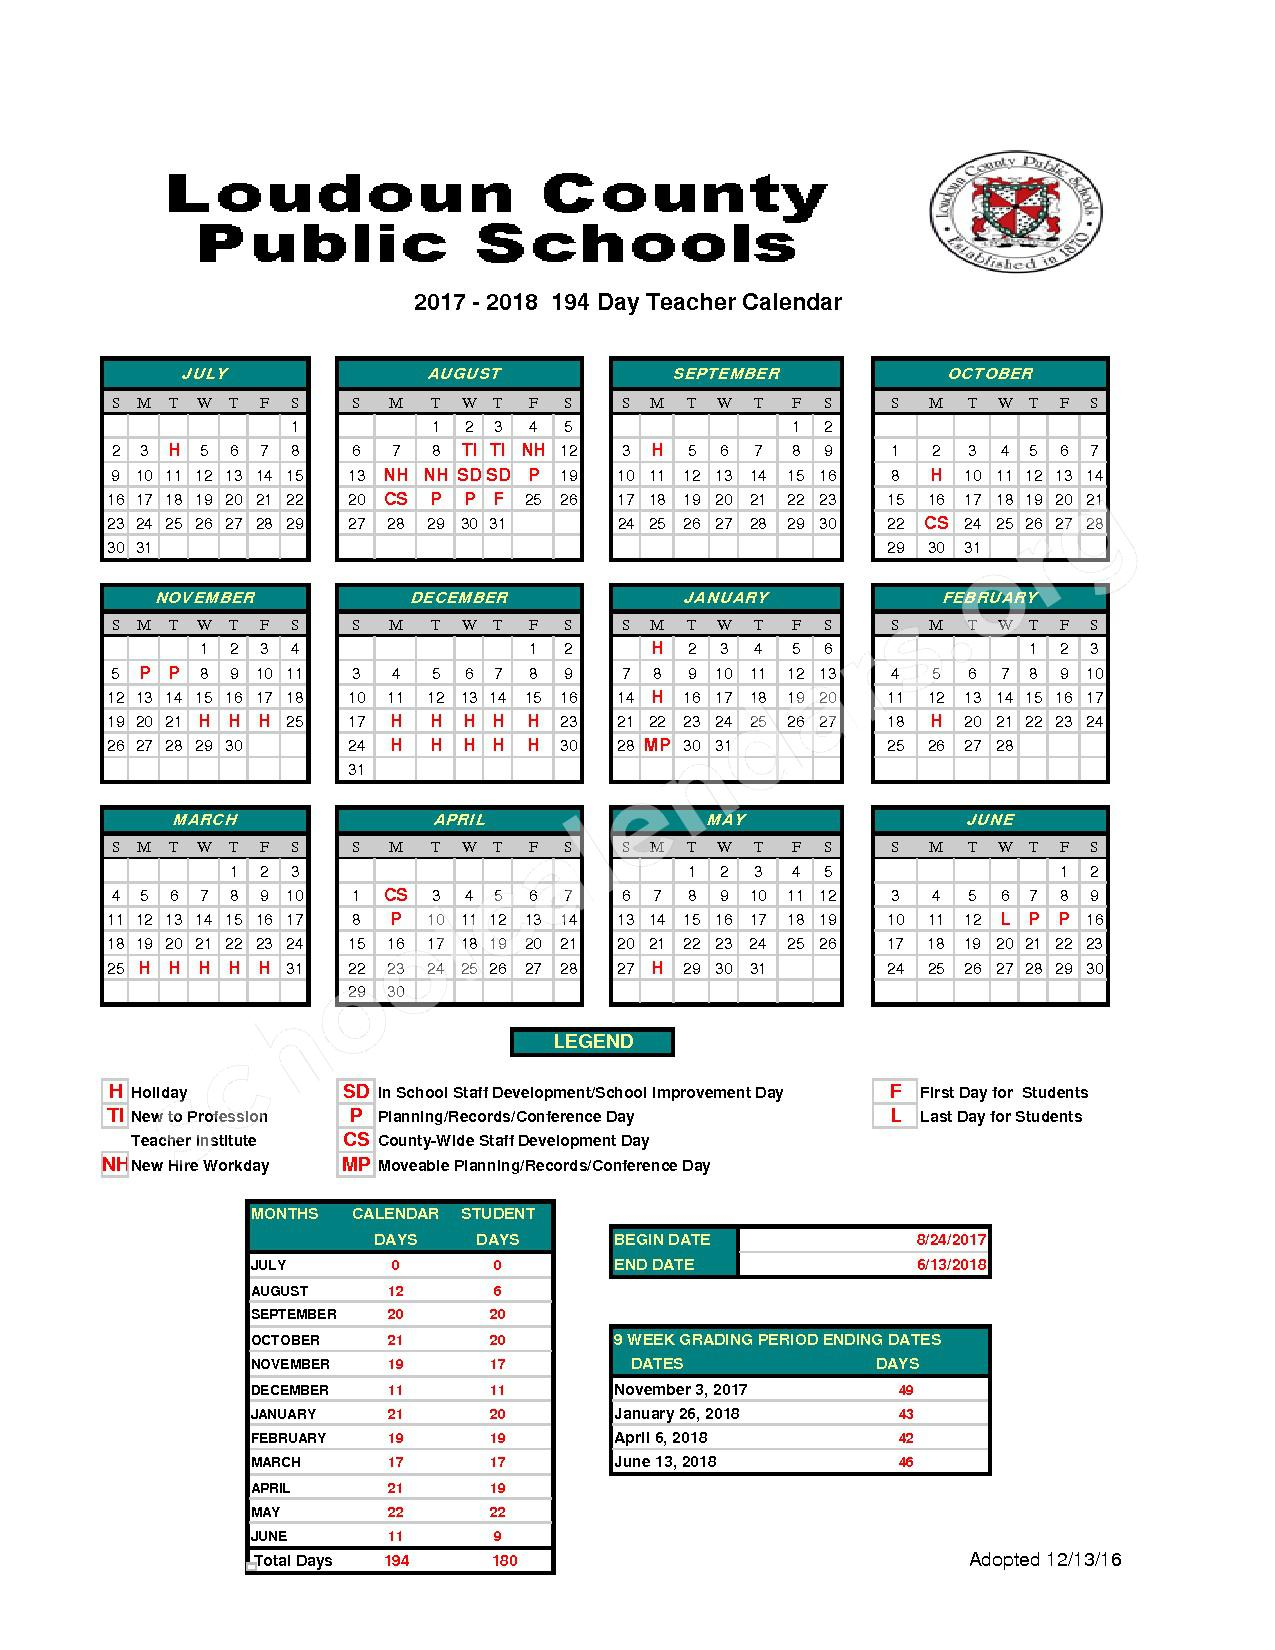 2017 - 2018 Teacher & Staff Calendar – Loudoun County Public Schools – page 1